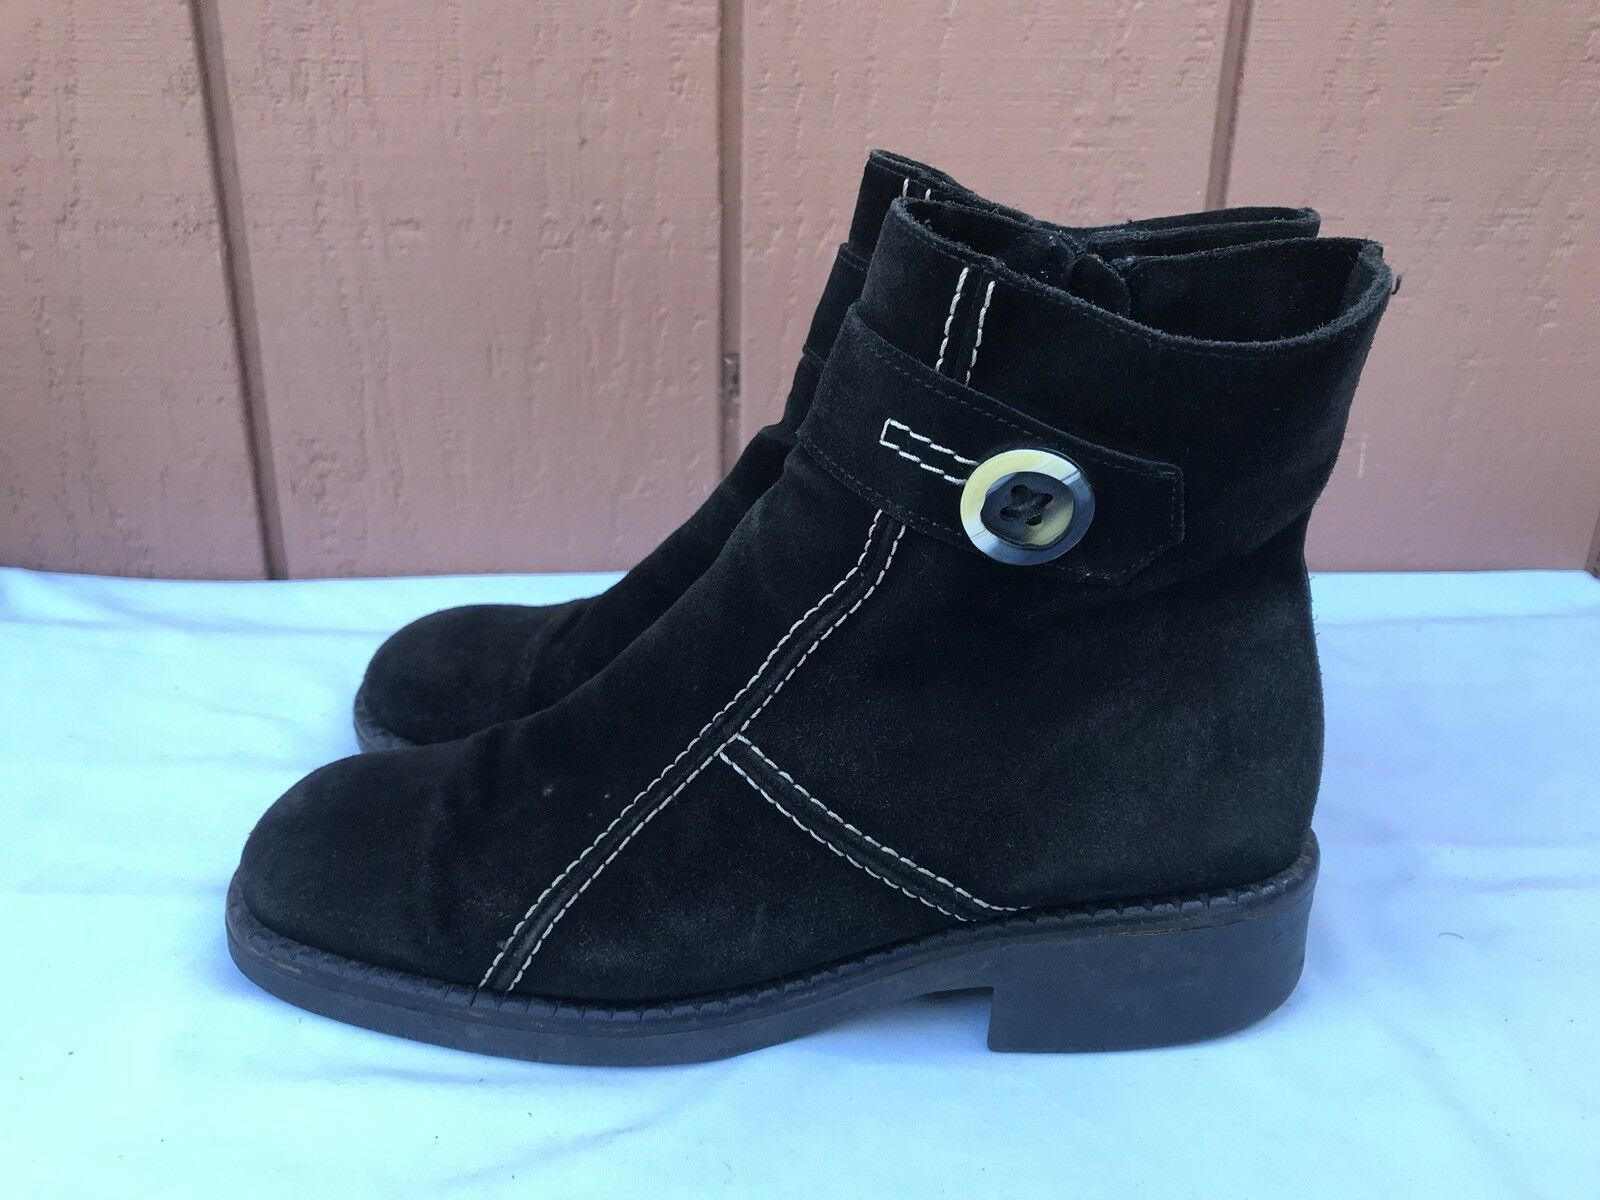 Raro C la canadiense para Mujer Moda Tobillo botas 11474 US 12 M Negro Gamuza Zip A9